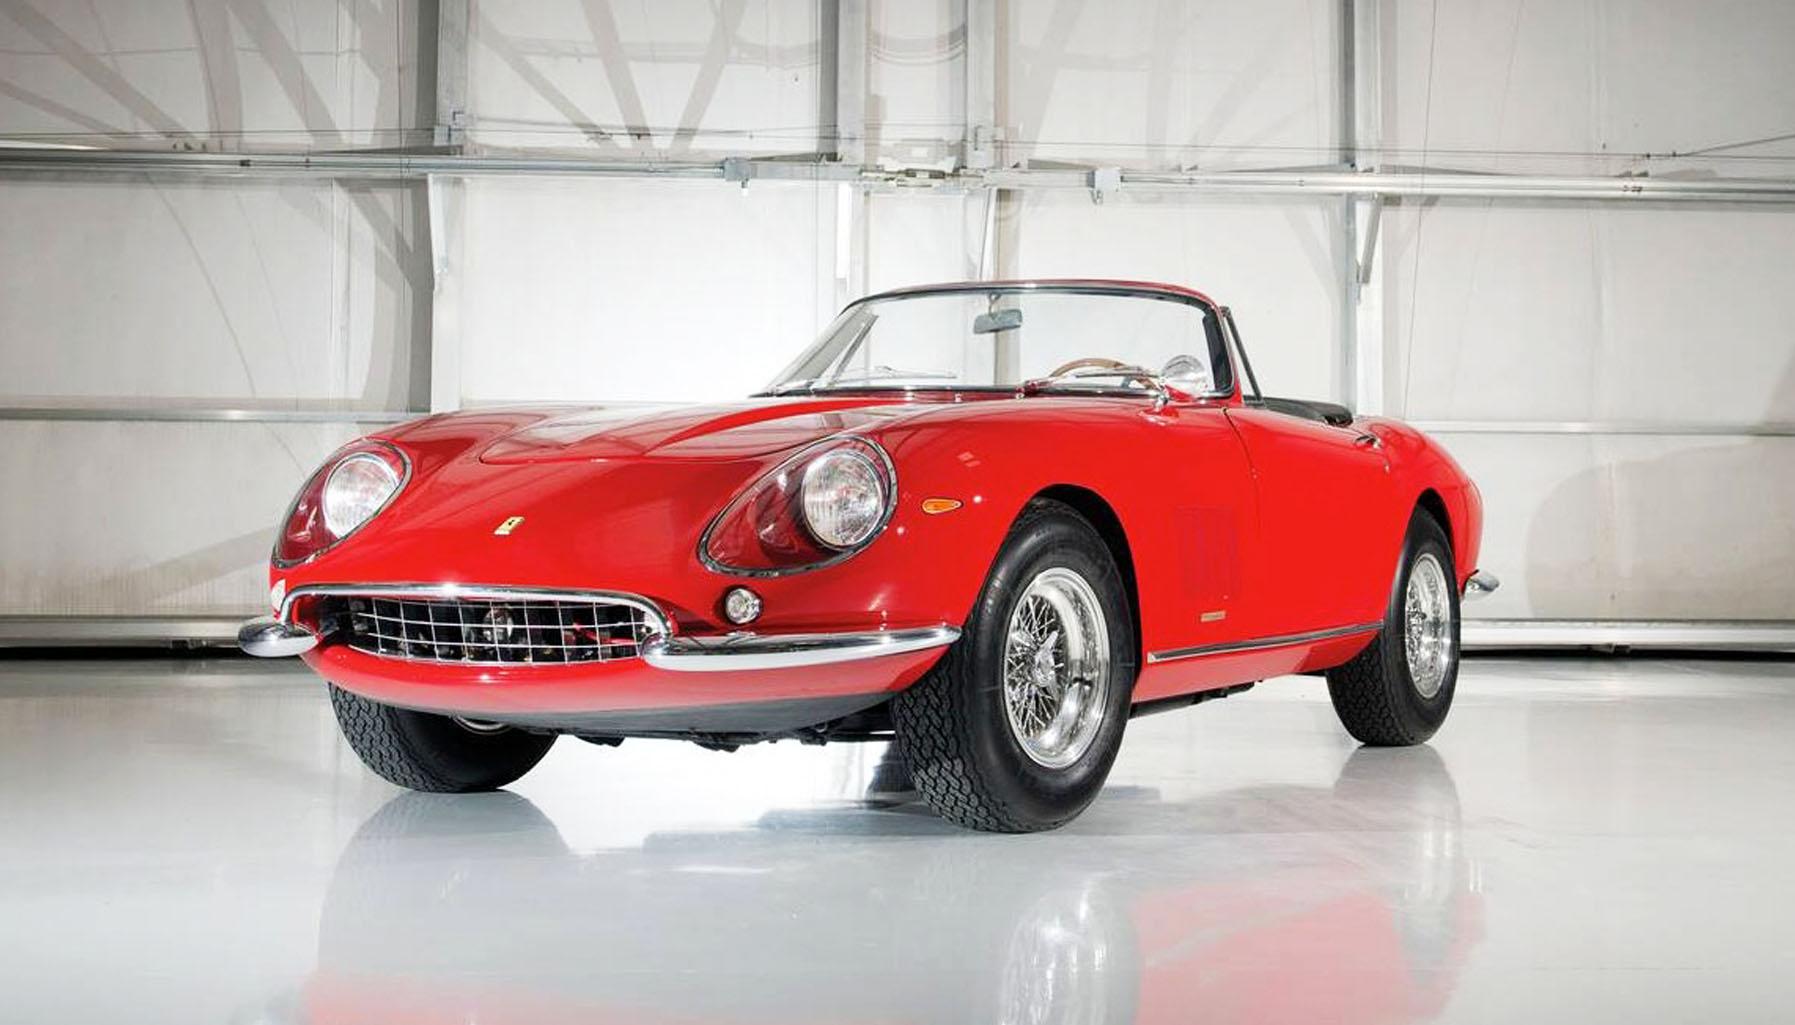 1967 Ferrari 275GTB/4 NART Spider chassis number 10709